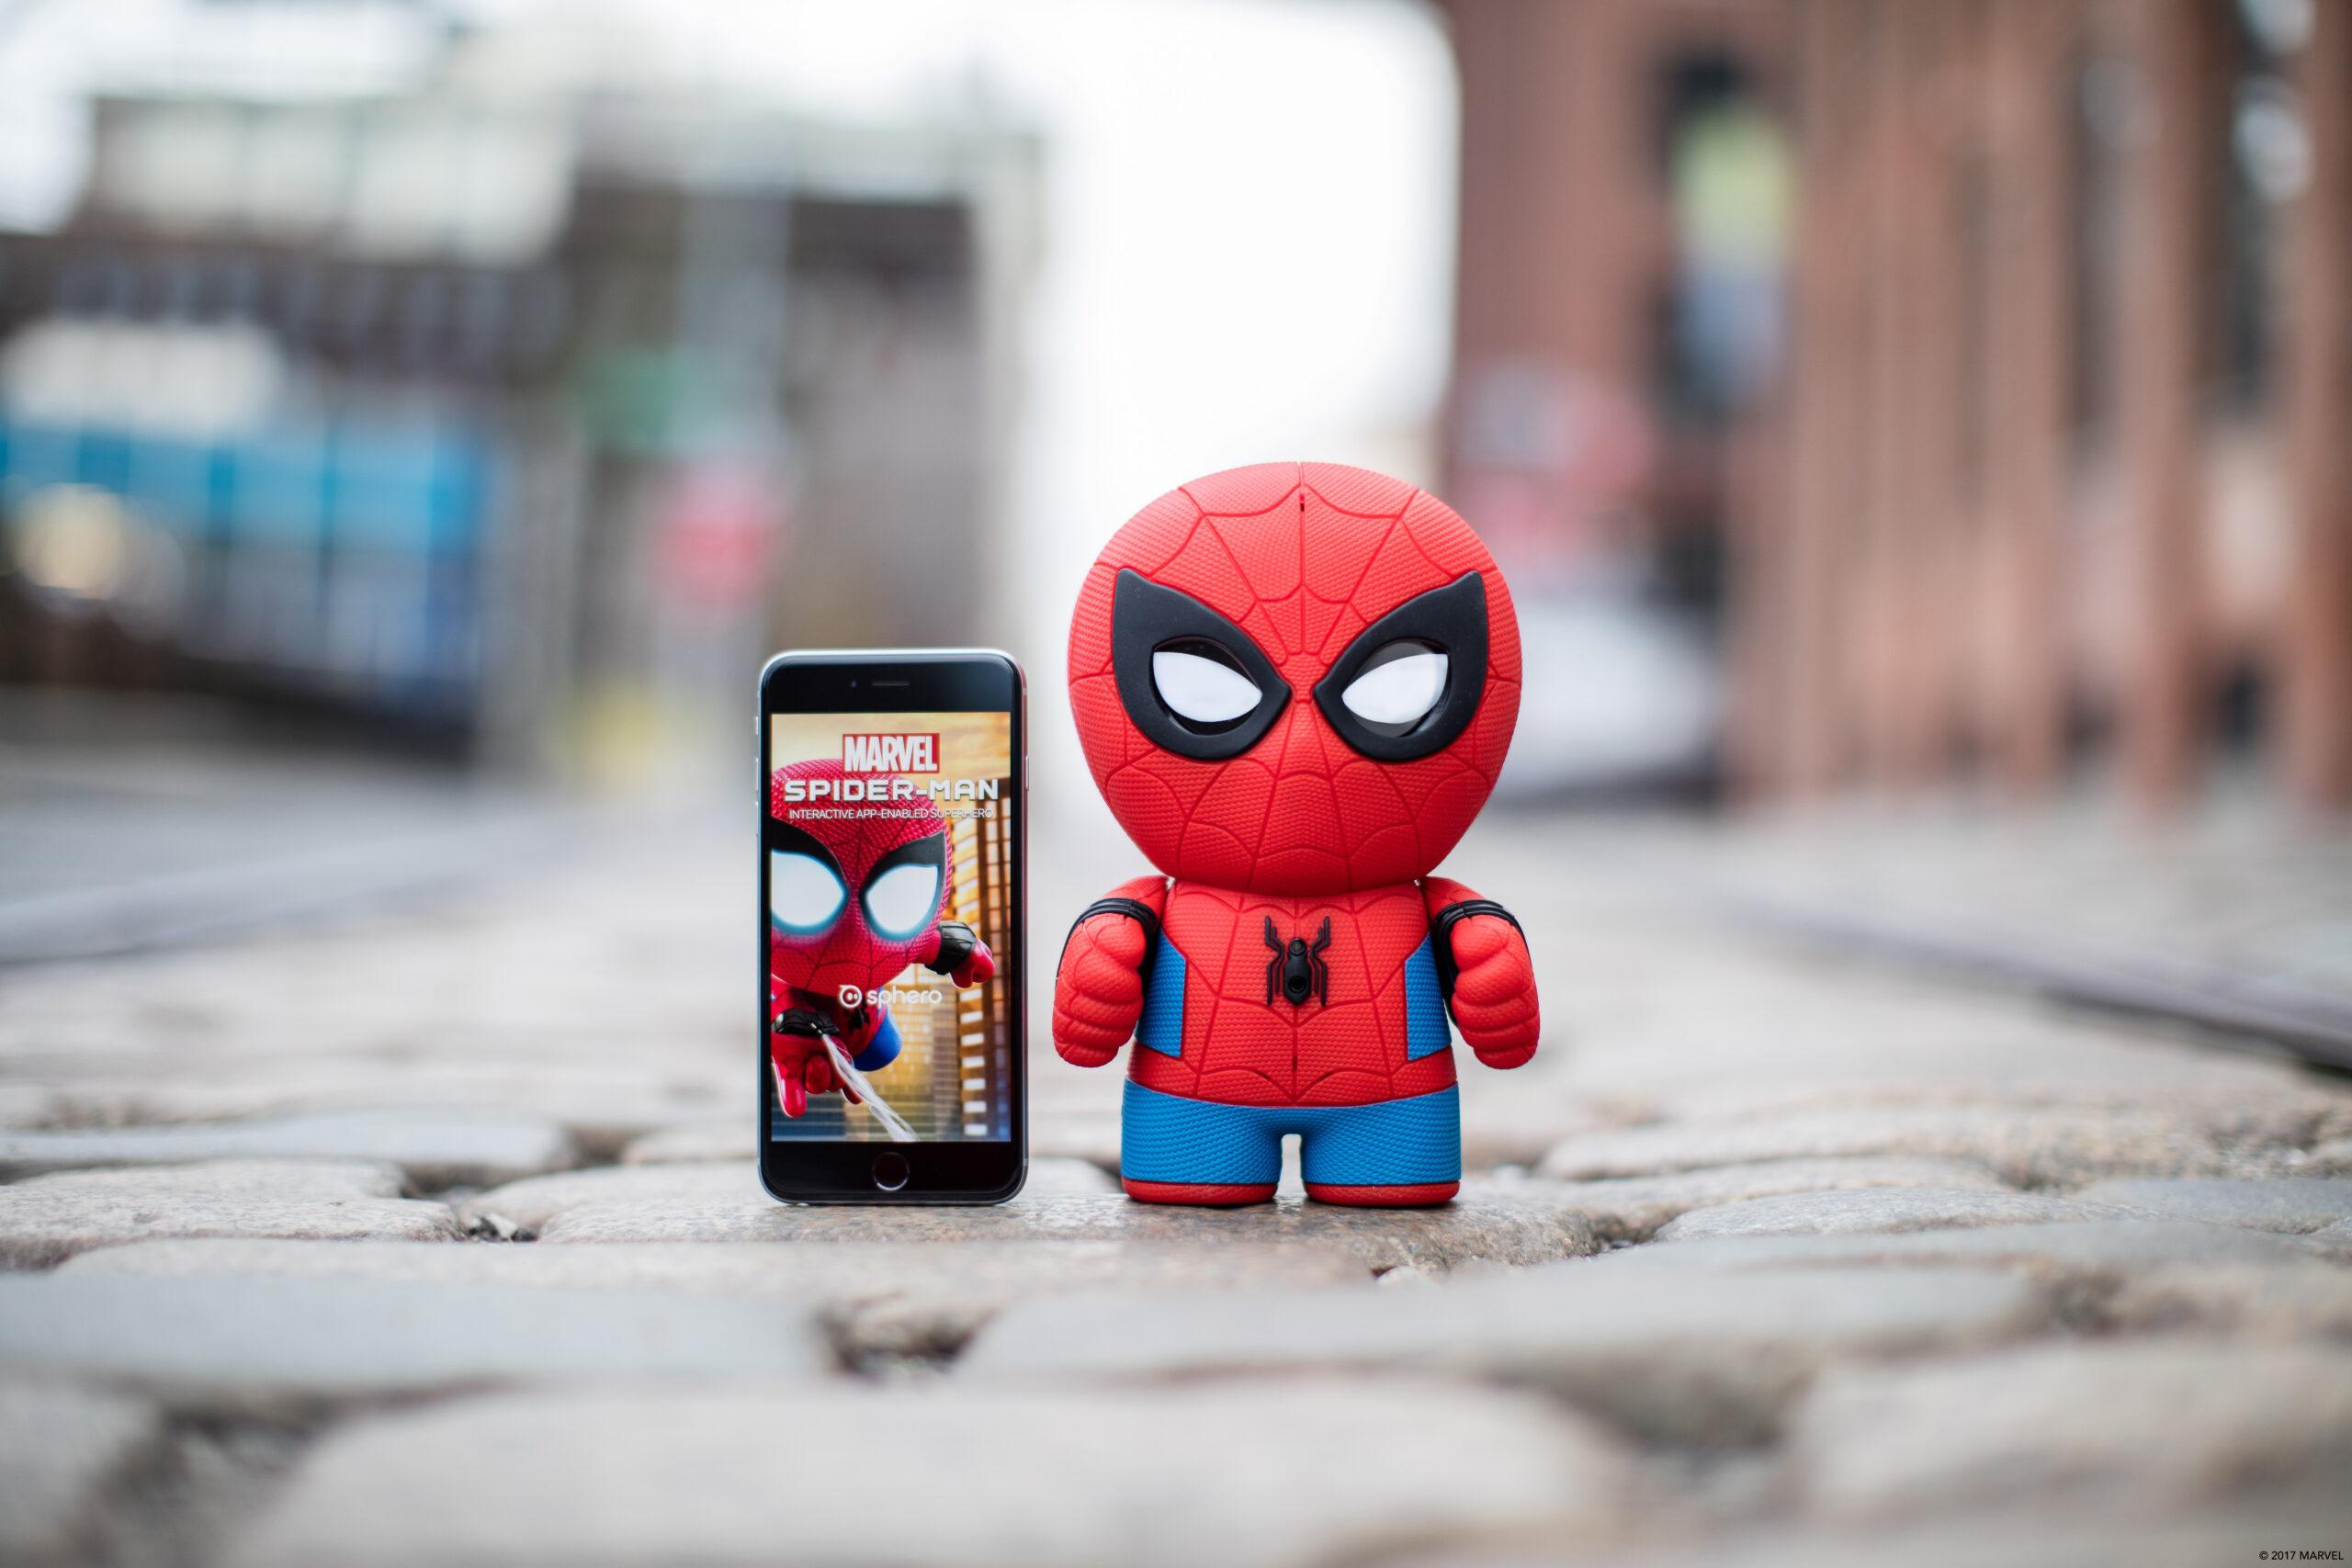 Sphero Spider-Man: The Interactive App-Enabled Super Hero